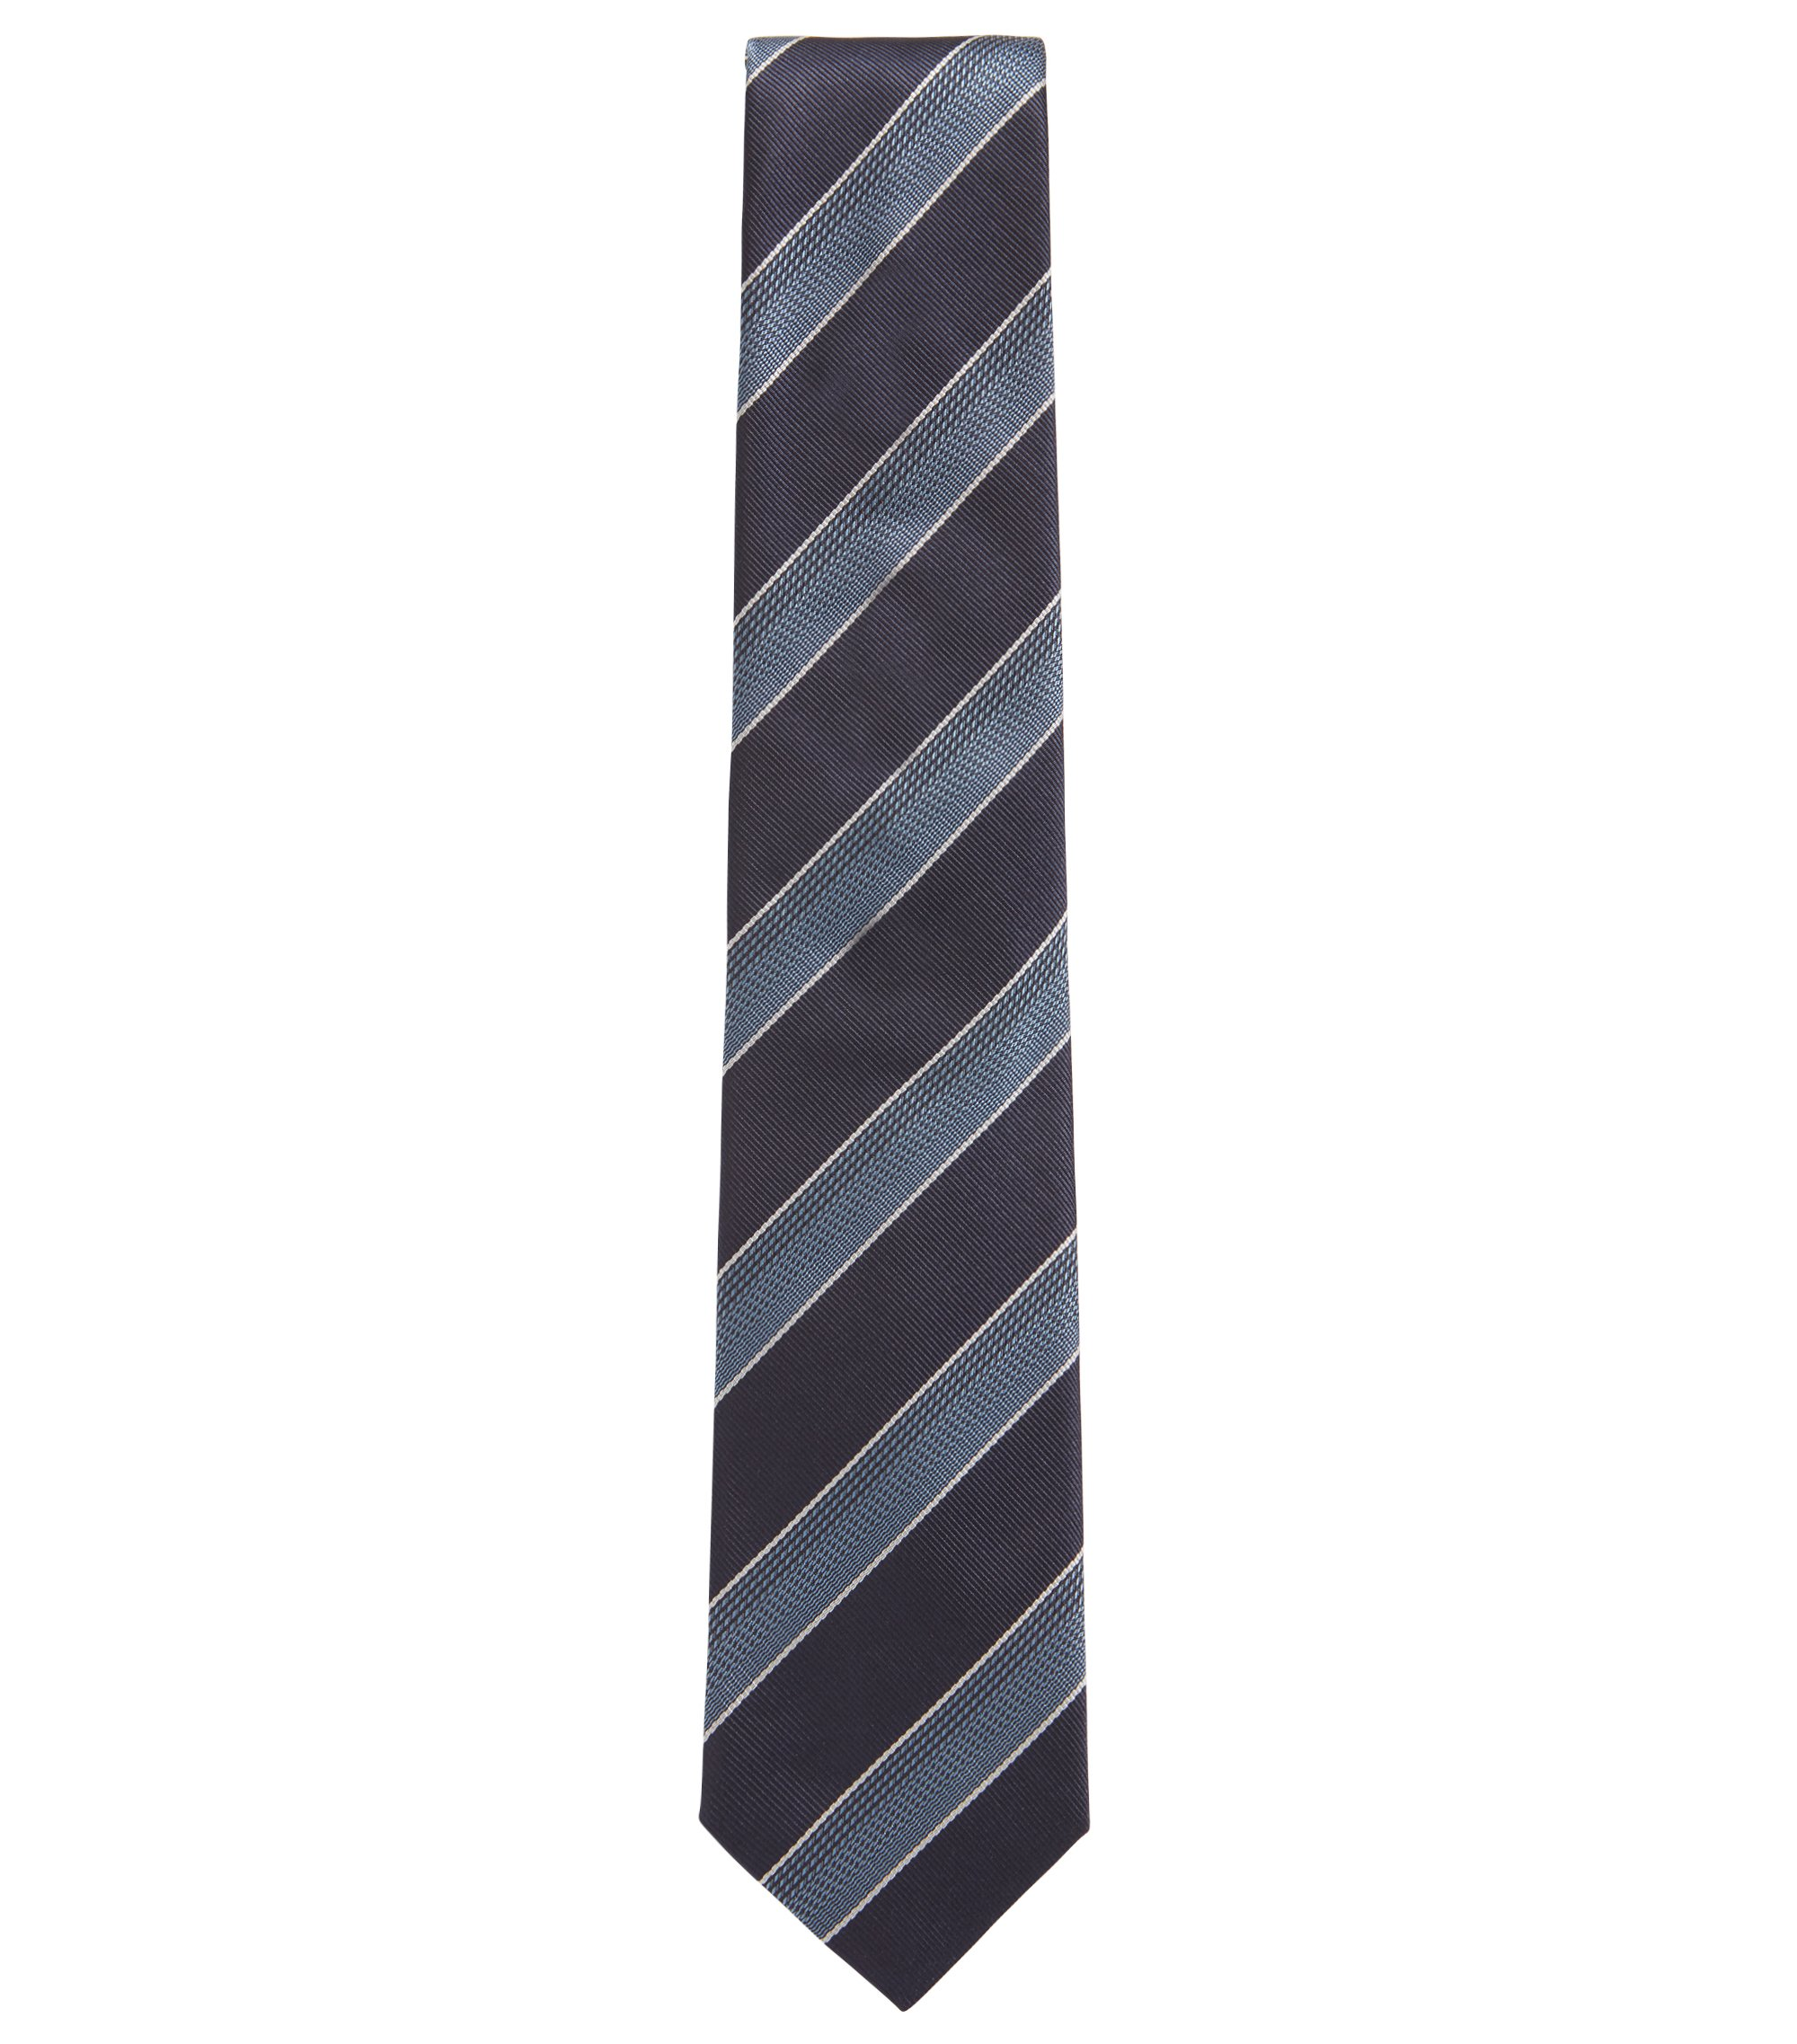 Corbata de rayas diagonales en tejido jacquard de seda con textura, Celeste